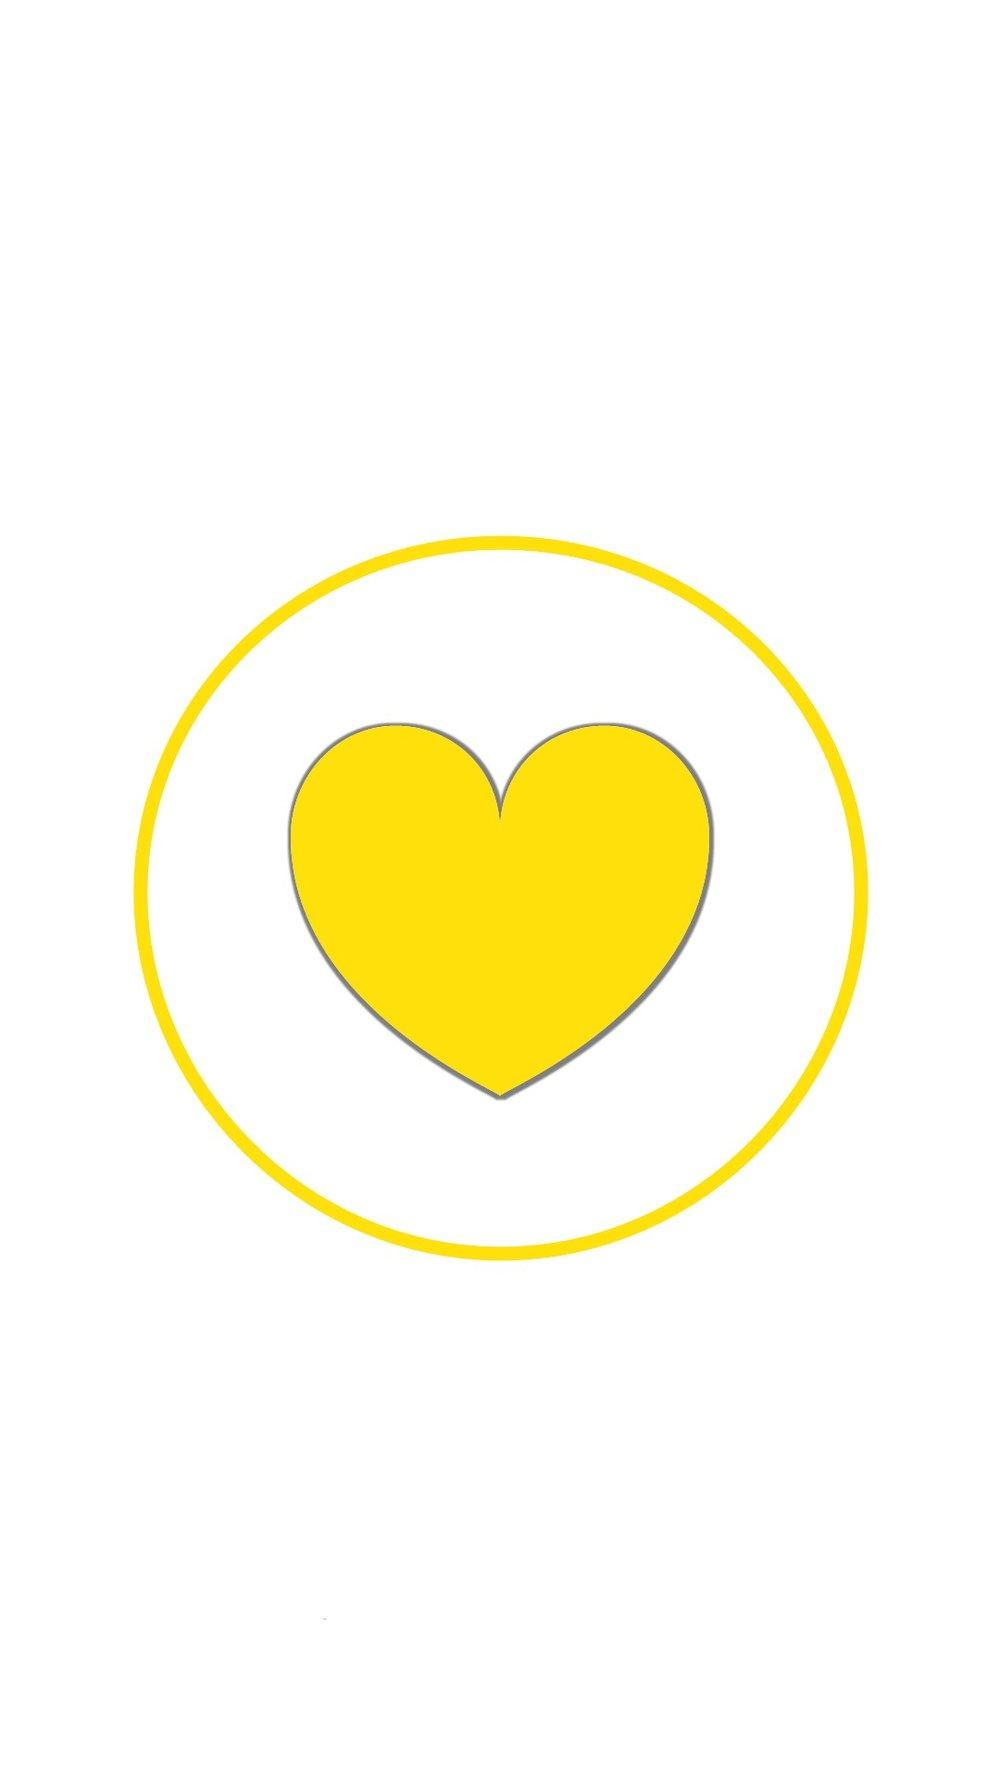 Instagram-cover-heart-yellow-lotnotes.com.jpg